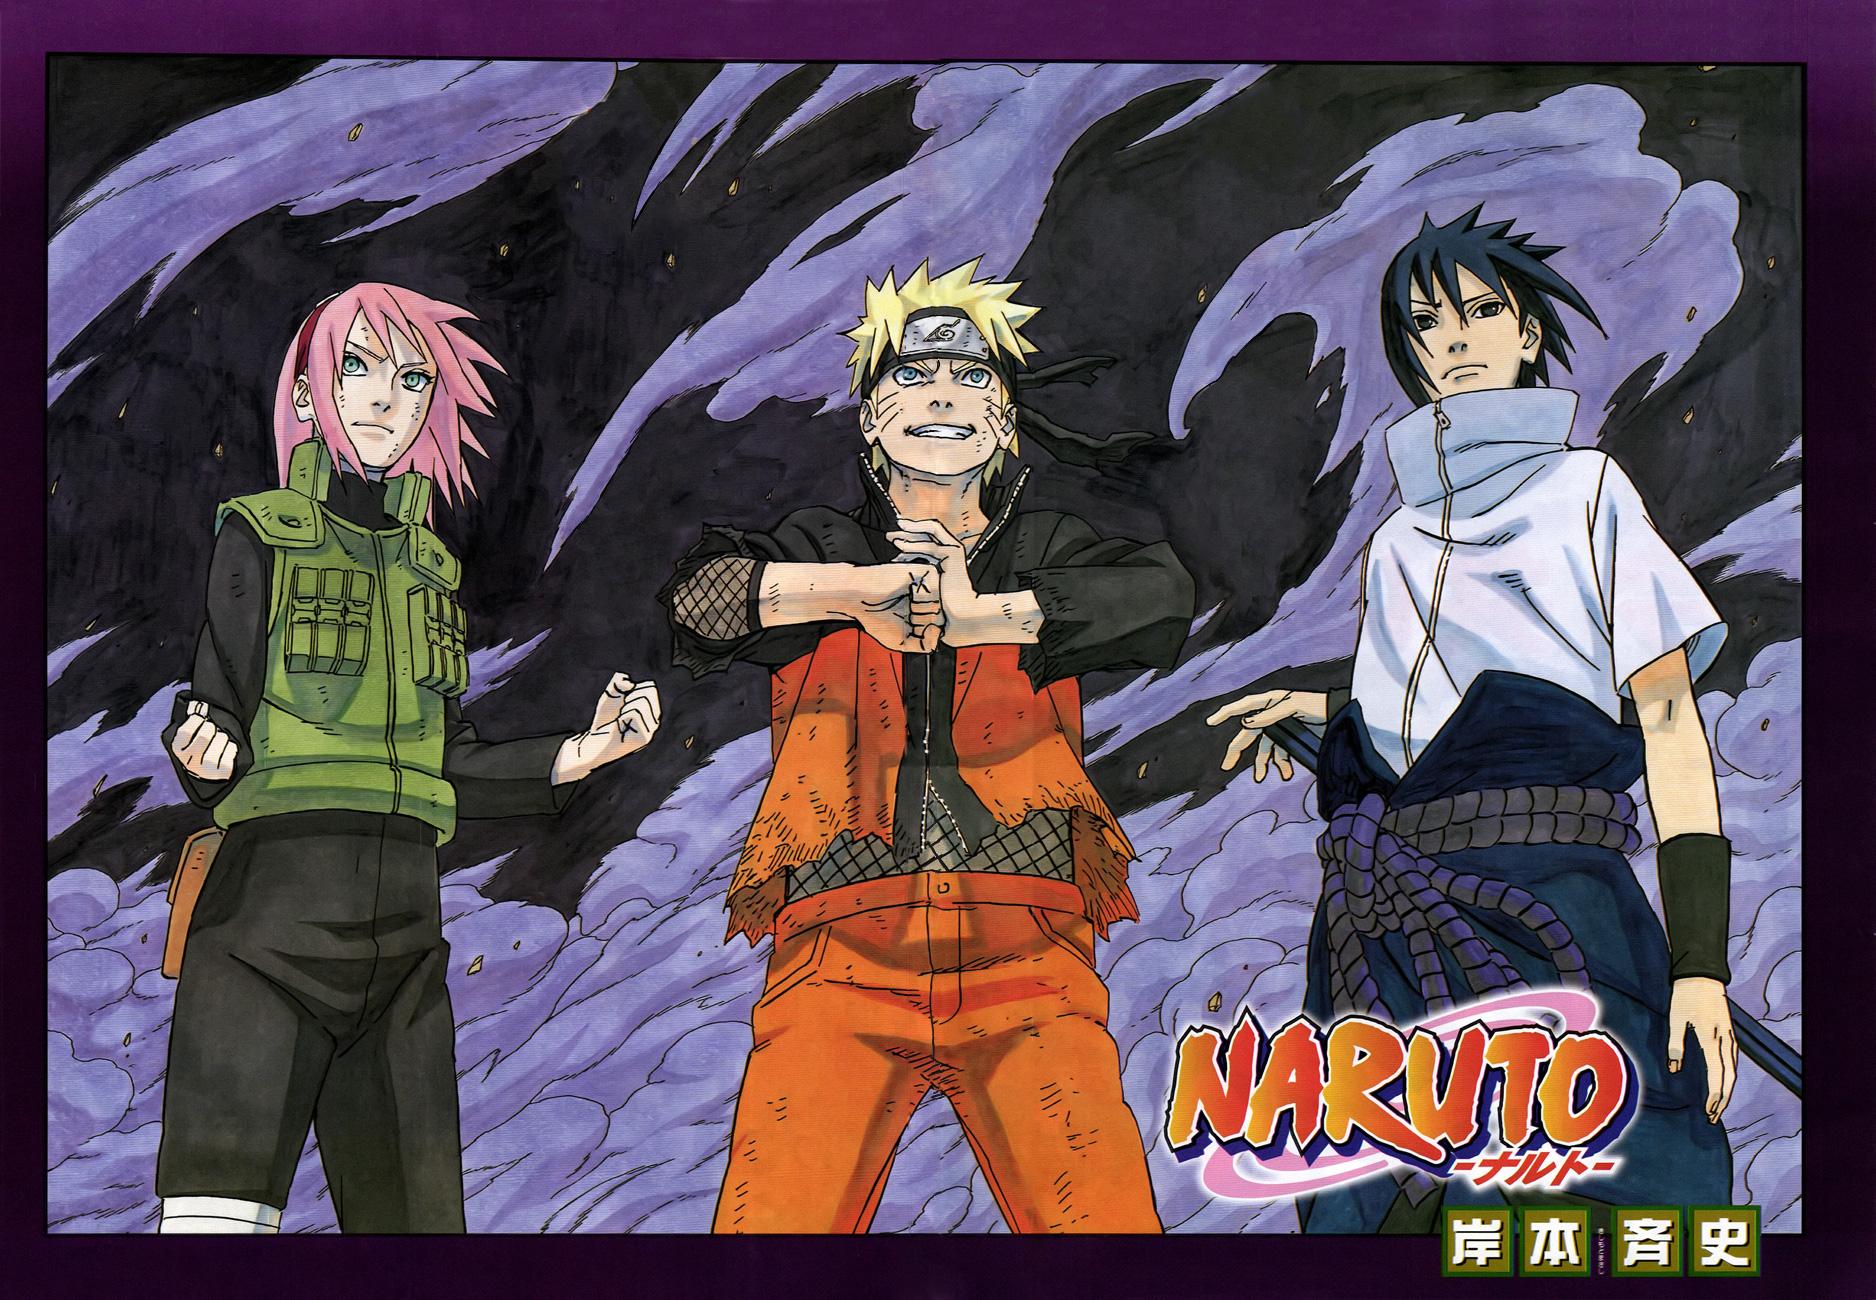 Sasuke and sakura coloring pages coloring pages - Naruto 1510366 Zerochan Naruto Full 1510366 Naruto 1510366 Zerochan Naruto Manga Color Pages